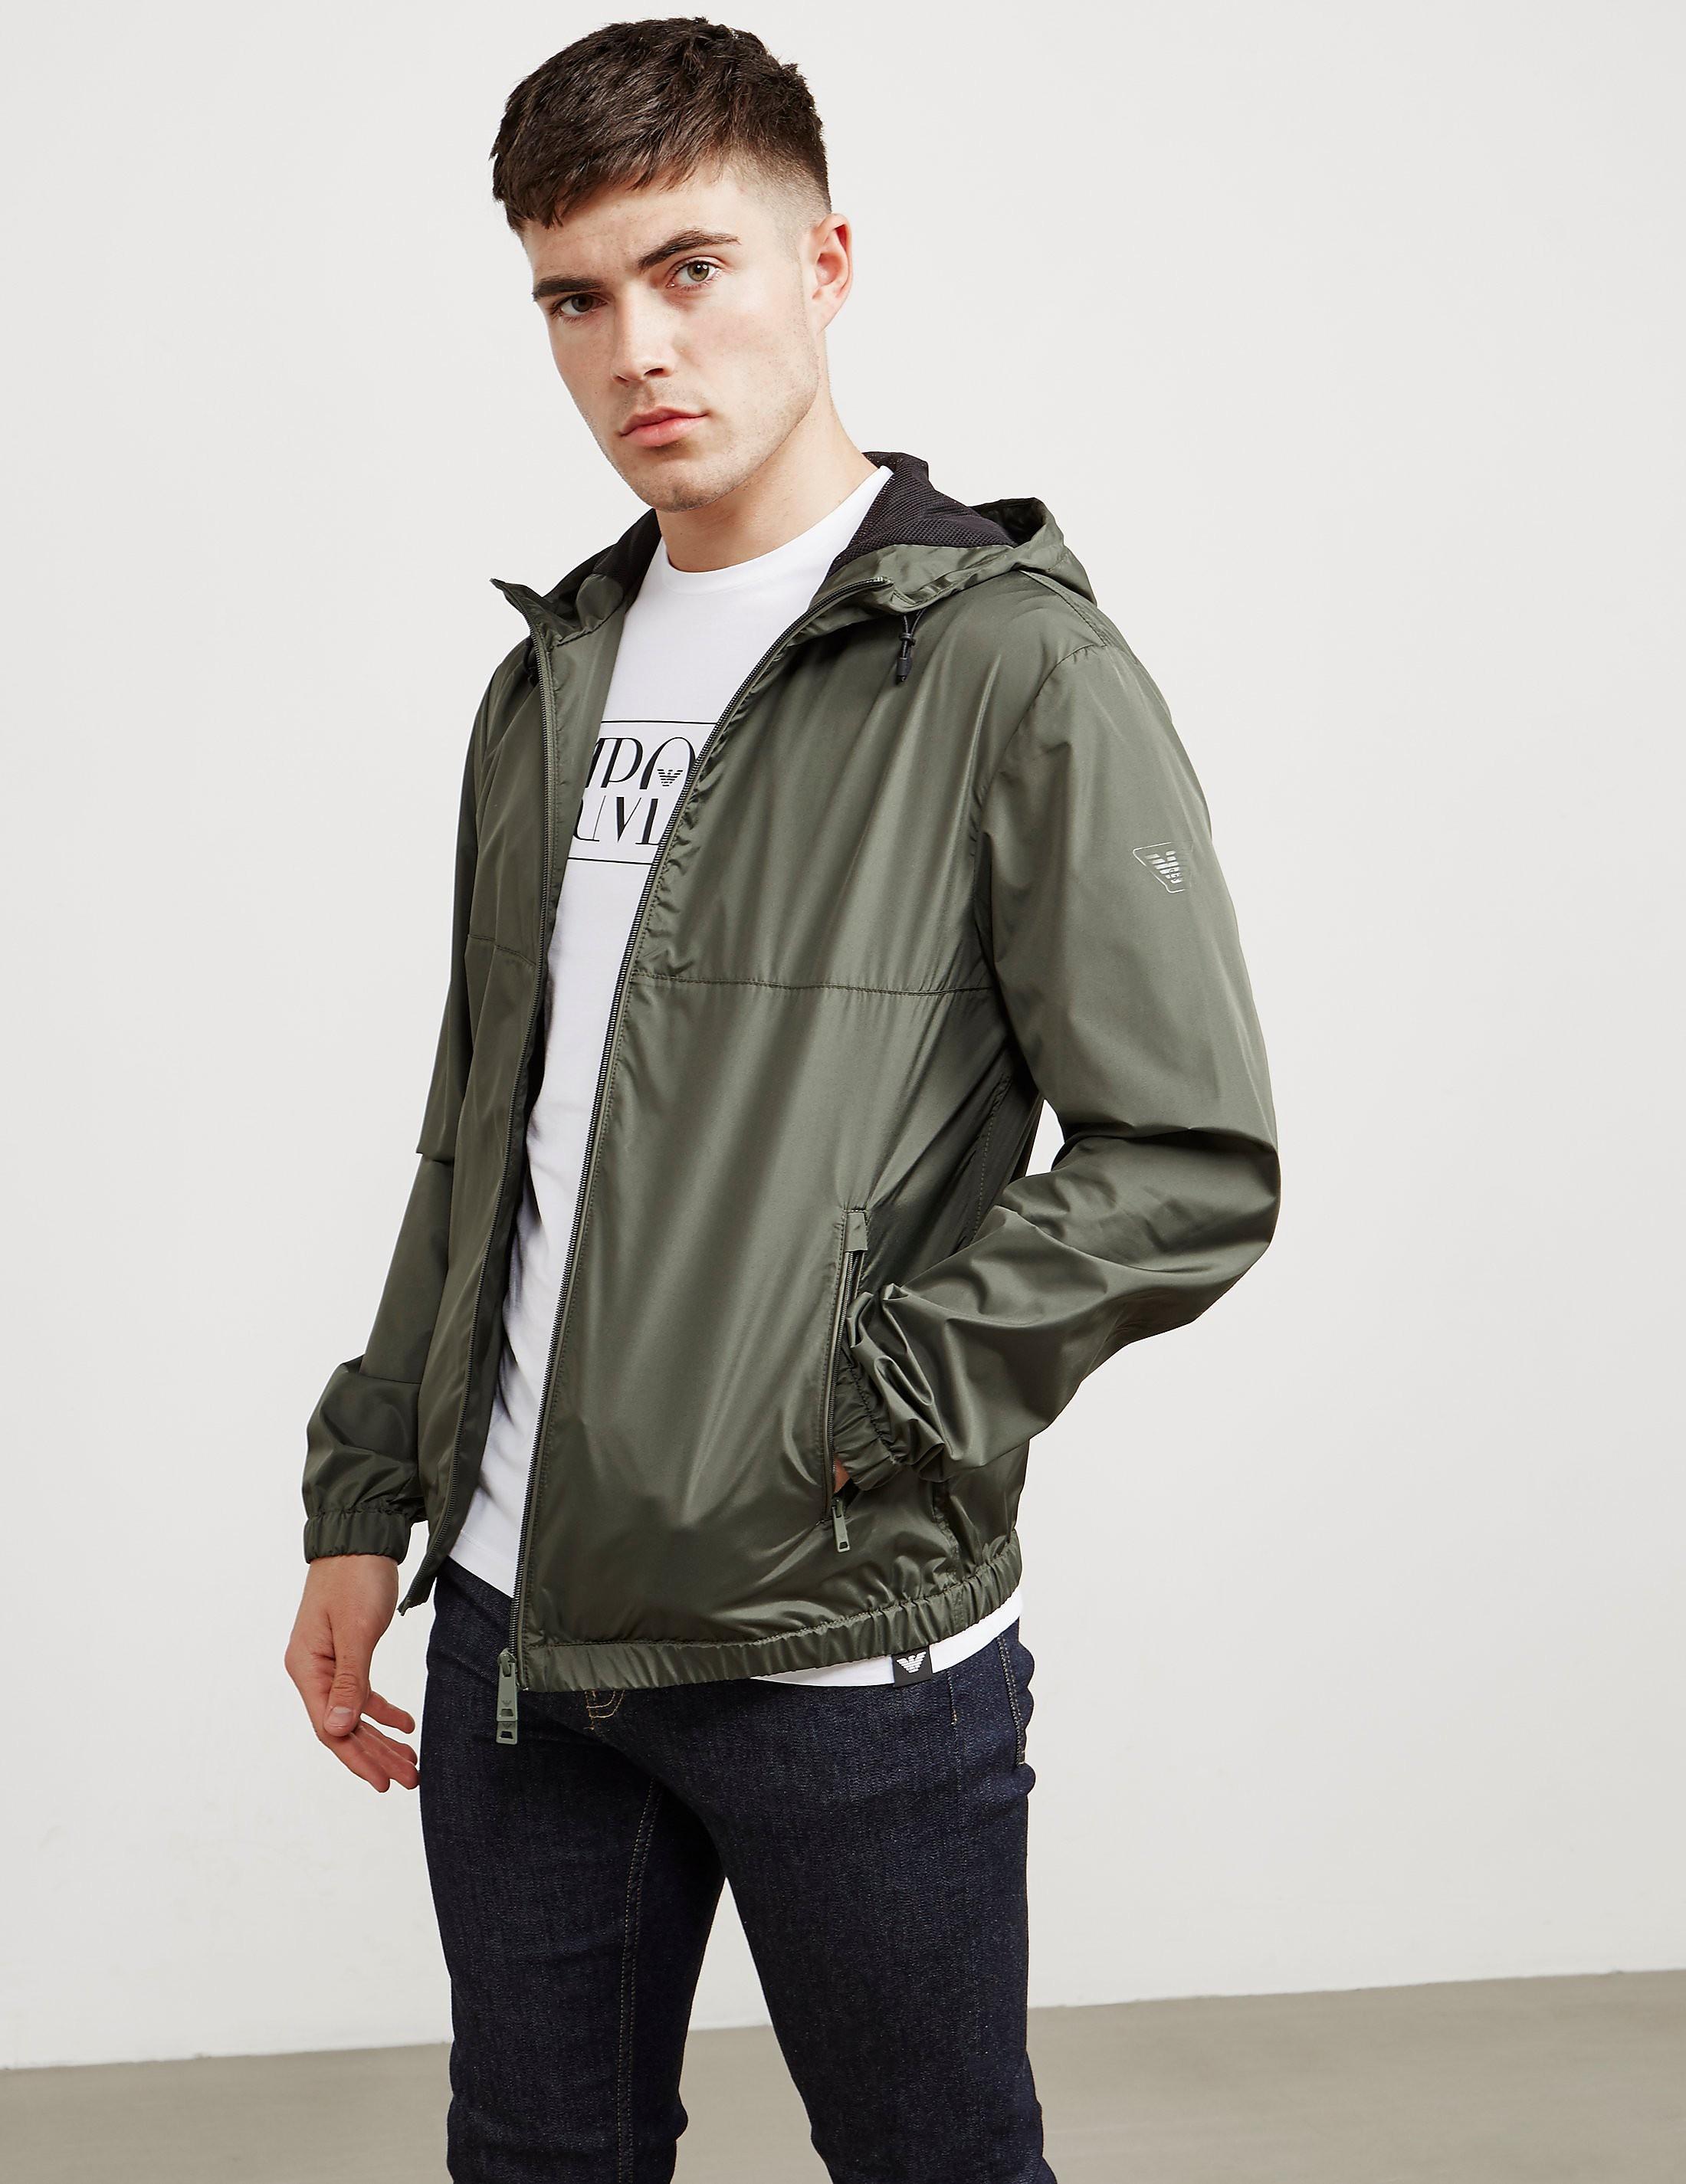 Emporio Armani Plain Hooded Jacket